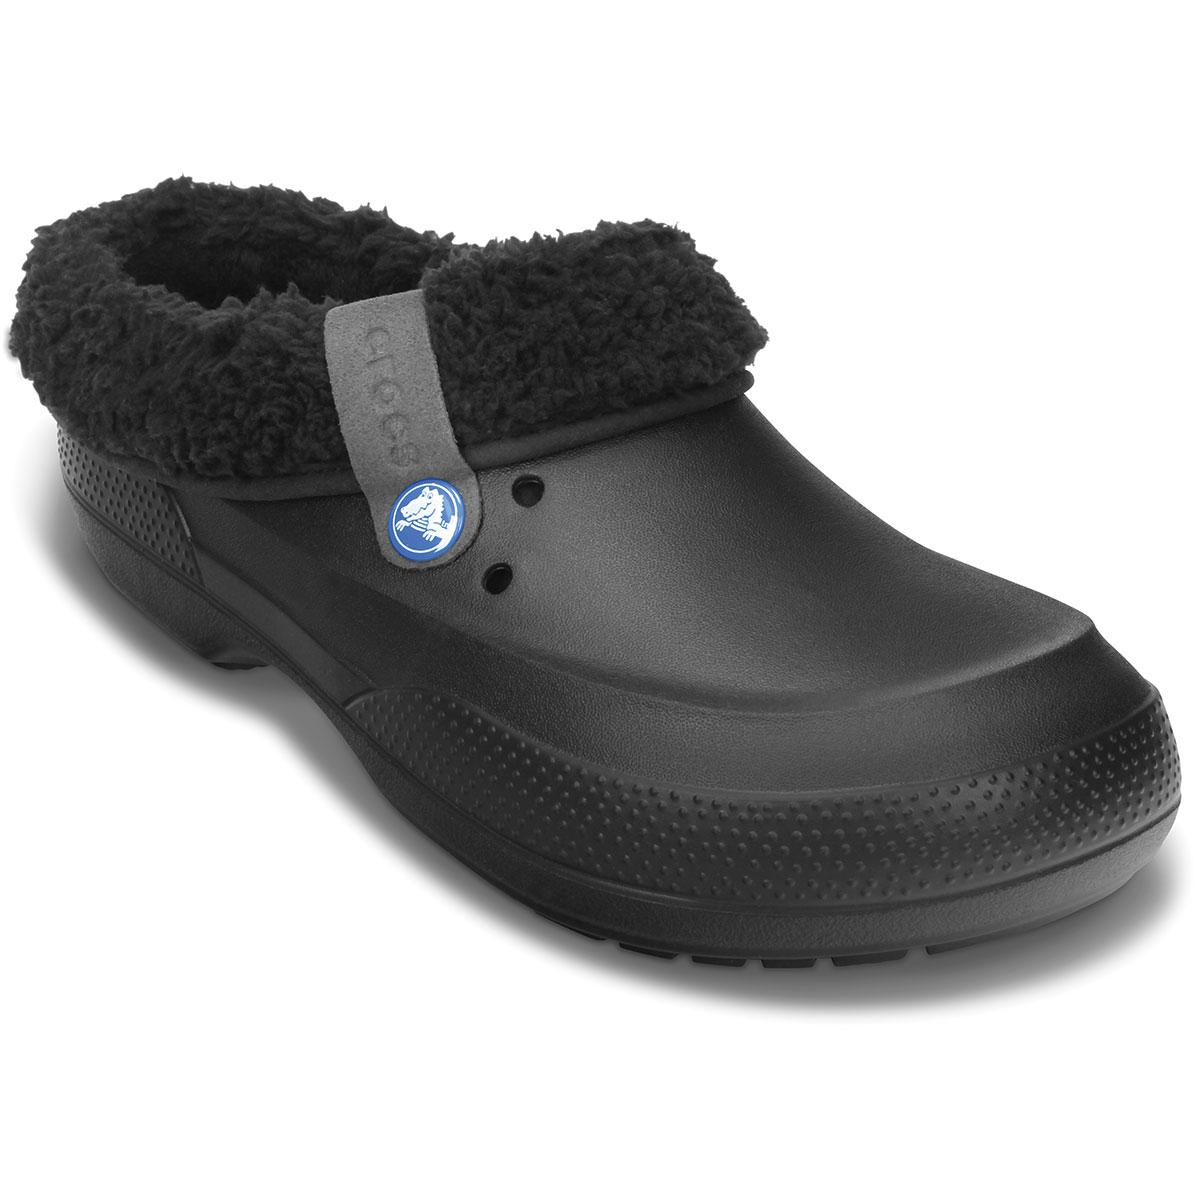 Crocs Unisex Blitzen Ii Fuzz Lined Clog - Black, 14